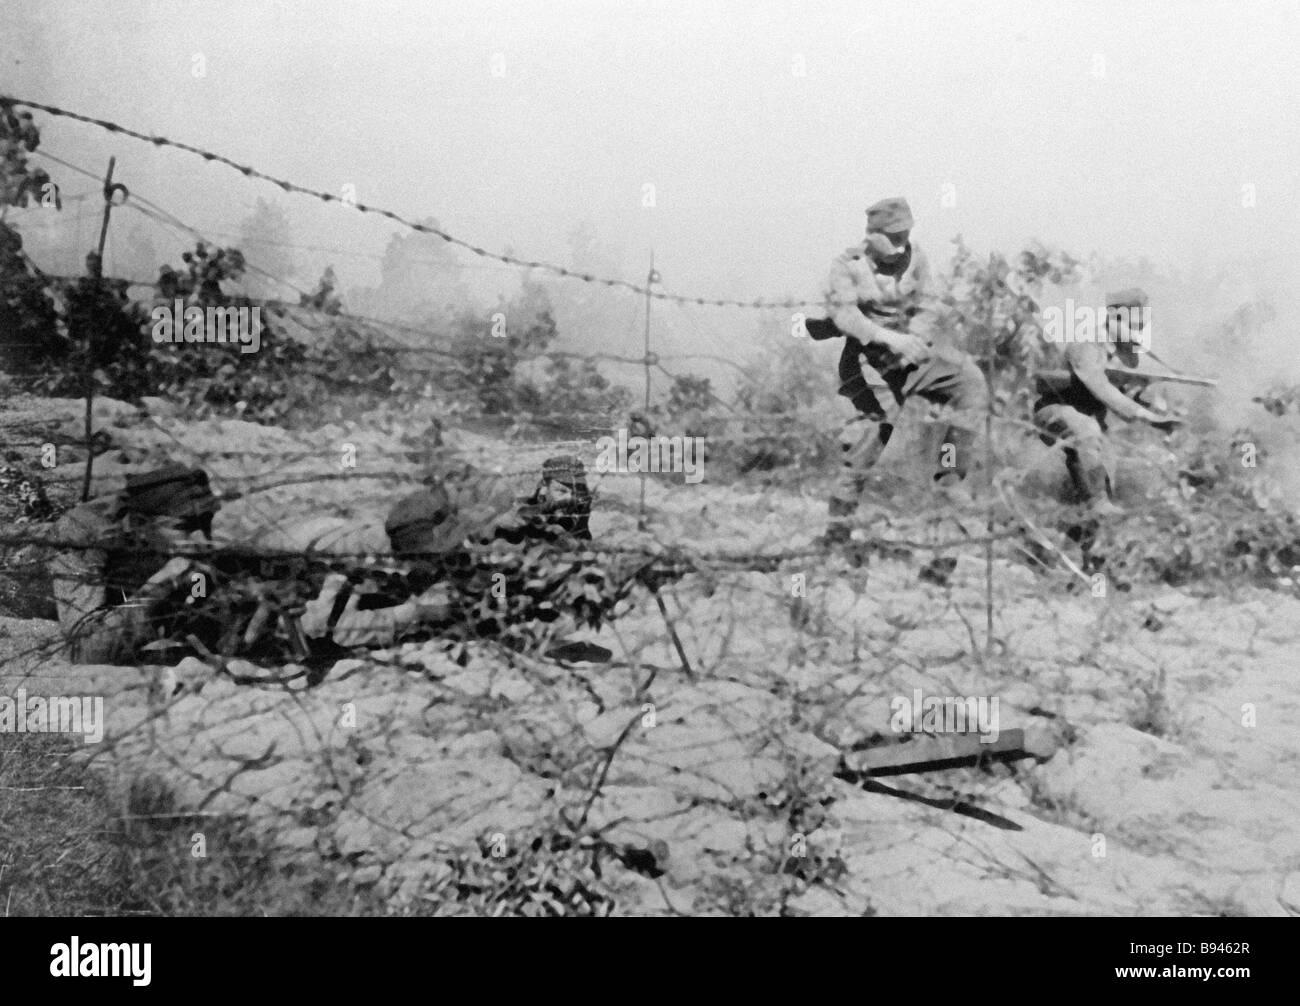 Wojsko Polskie 1st Army troops negotiate an enemy barbed wire entanglement - Stock Image